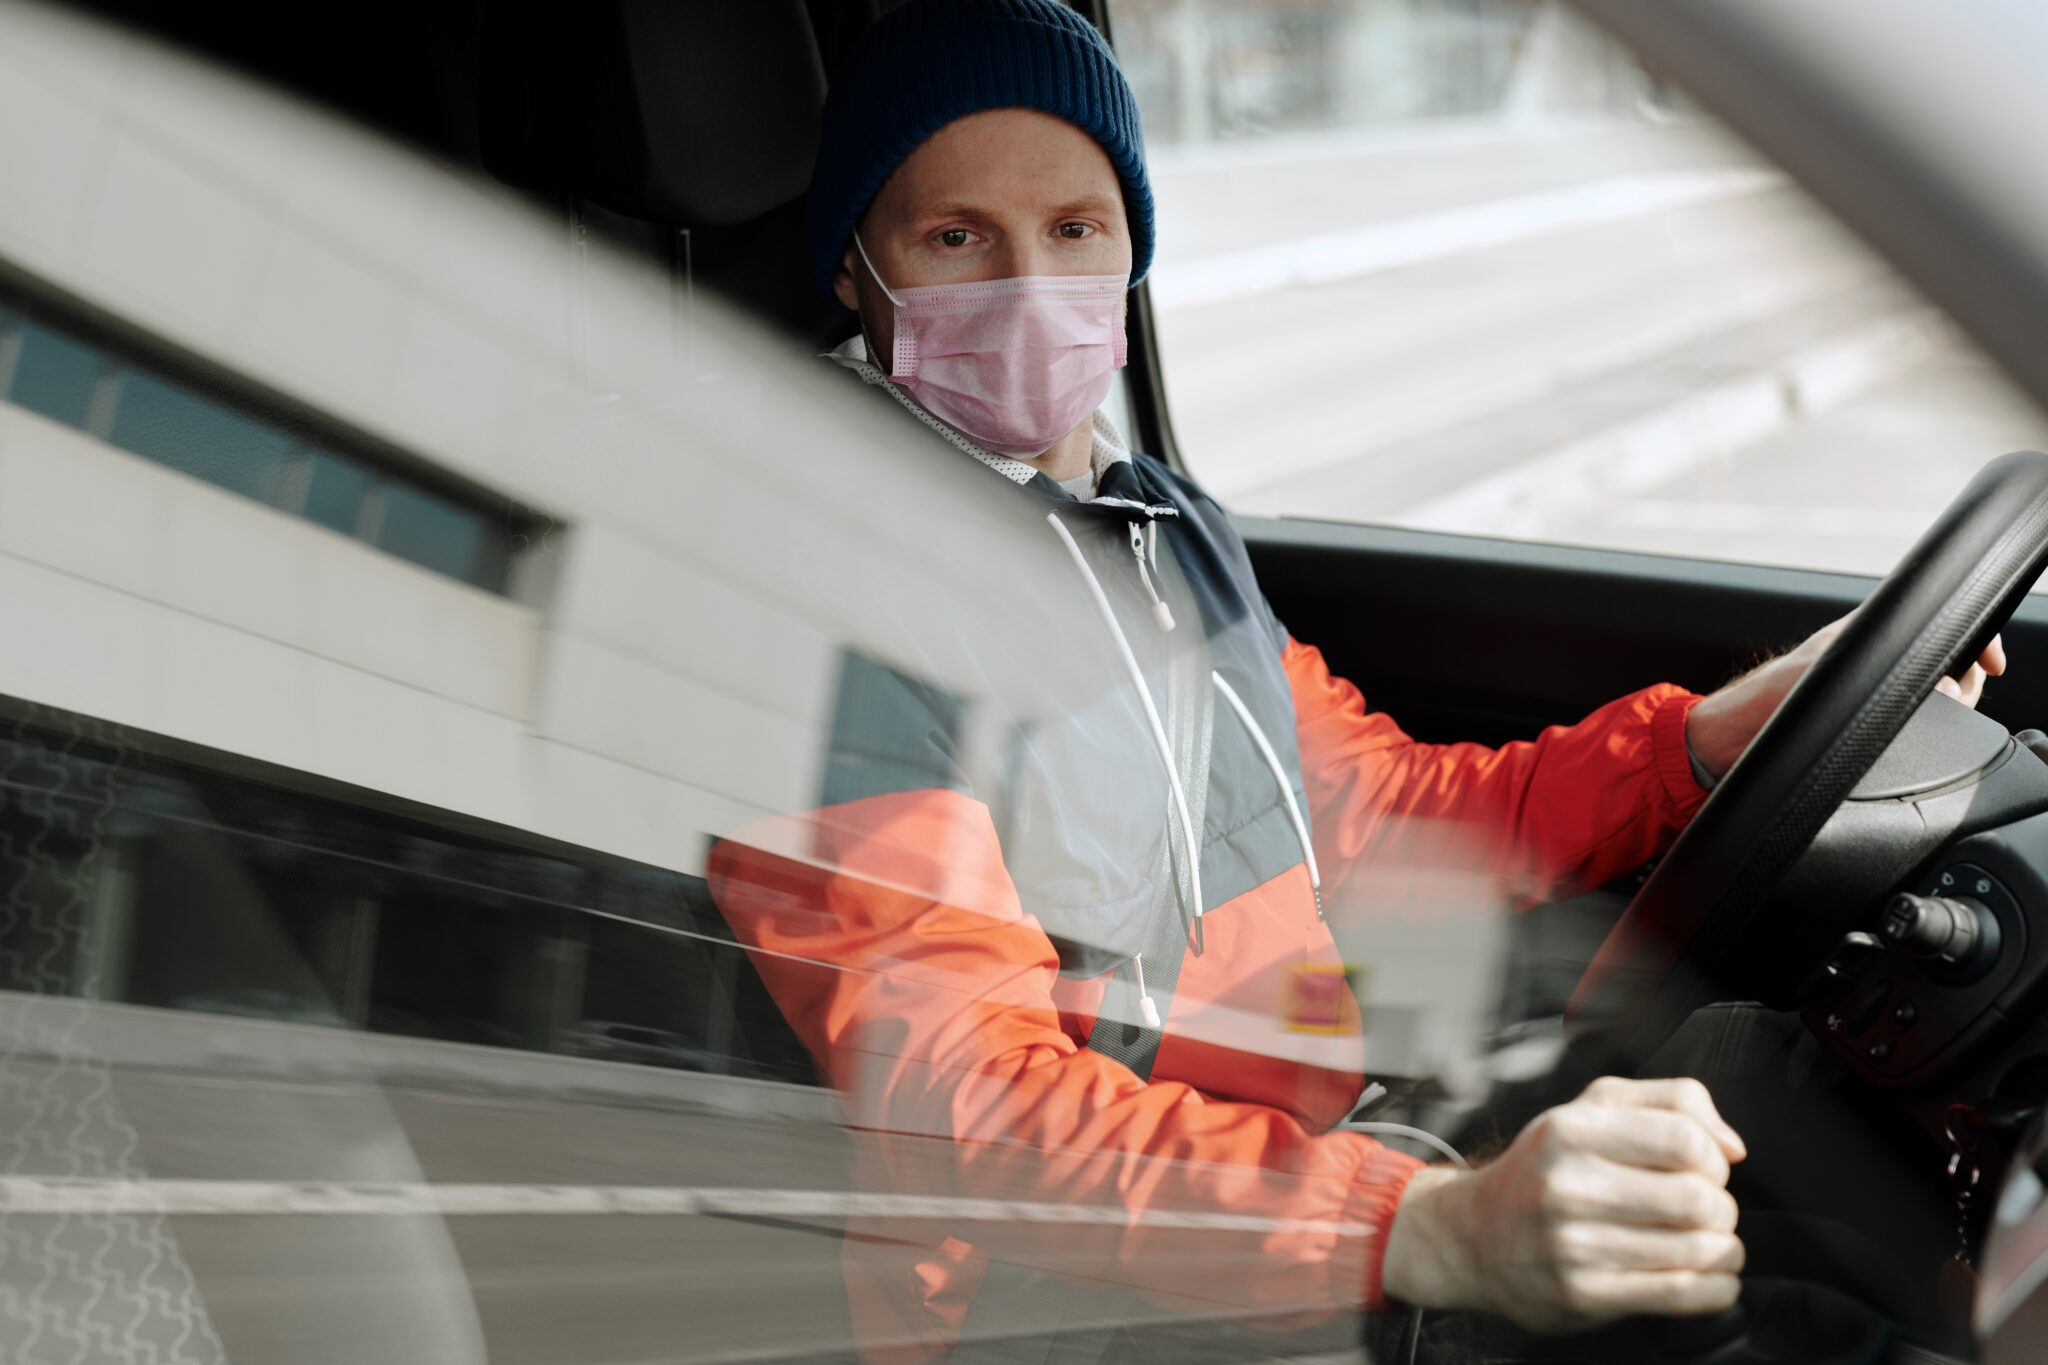 Como evitar problemas conduciendo con mascarilla